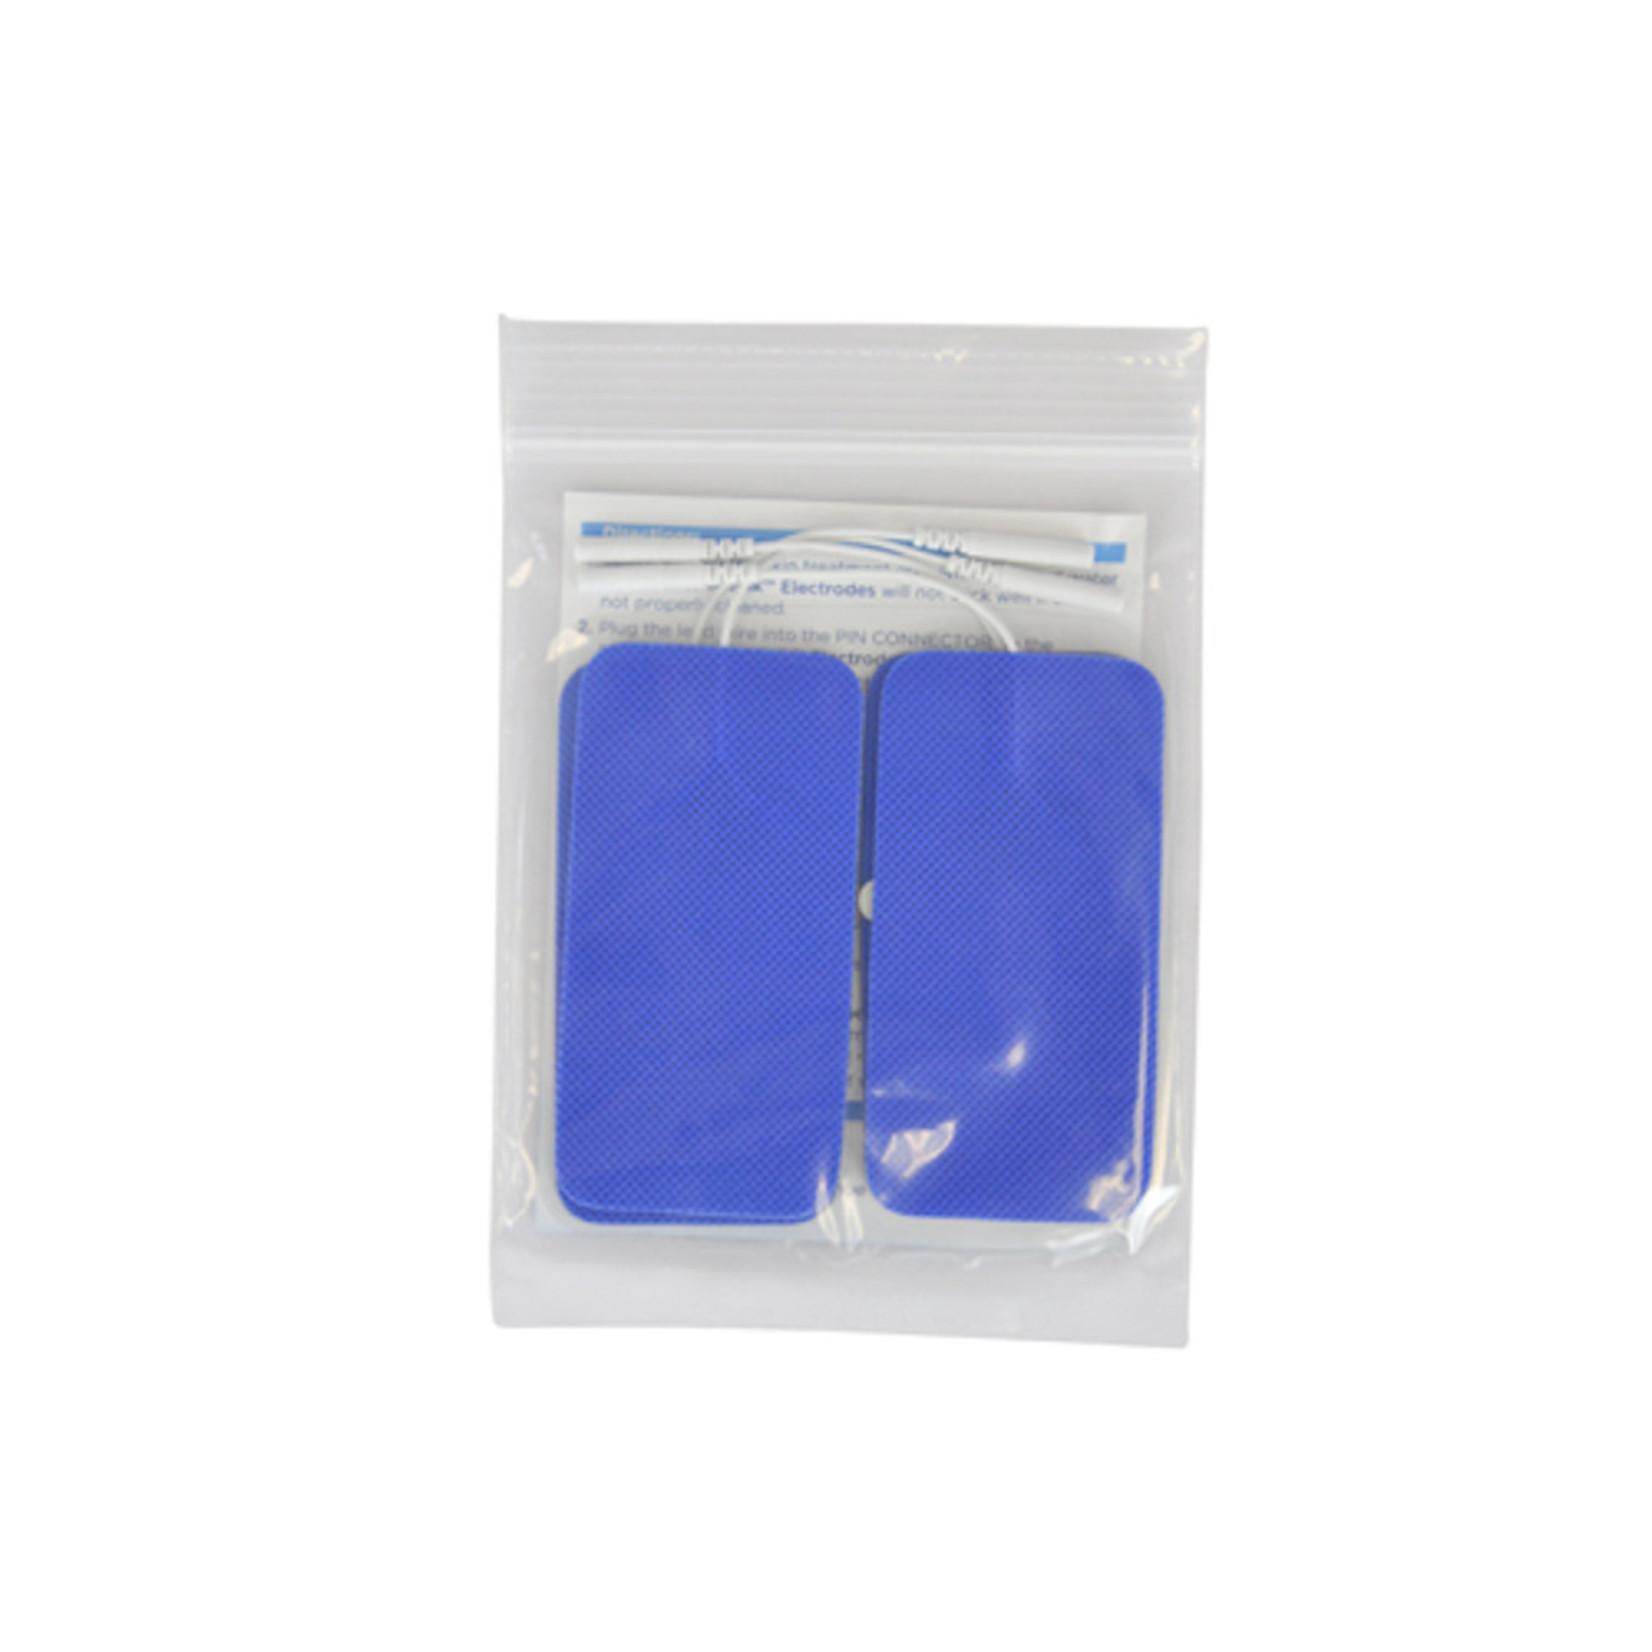 Electrode 2 x 4